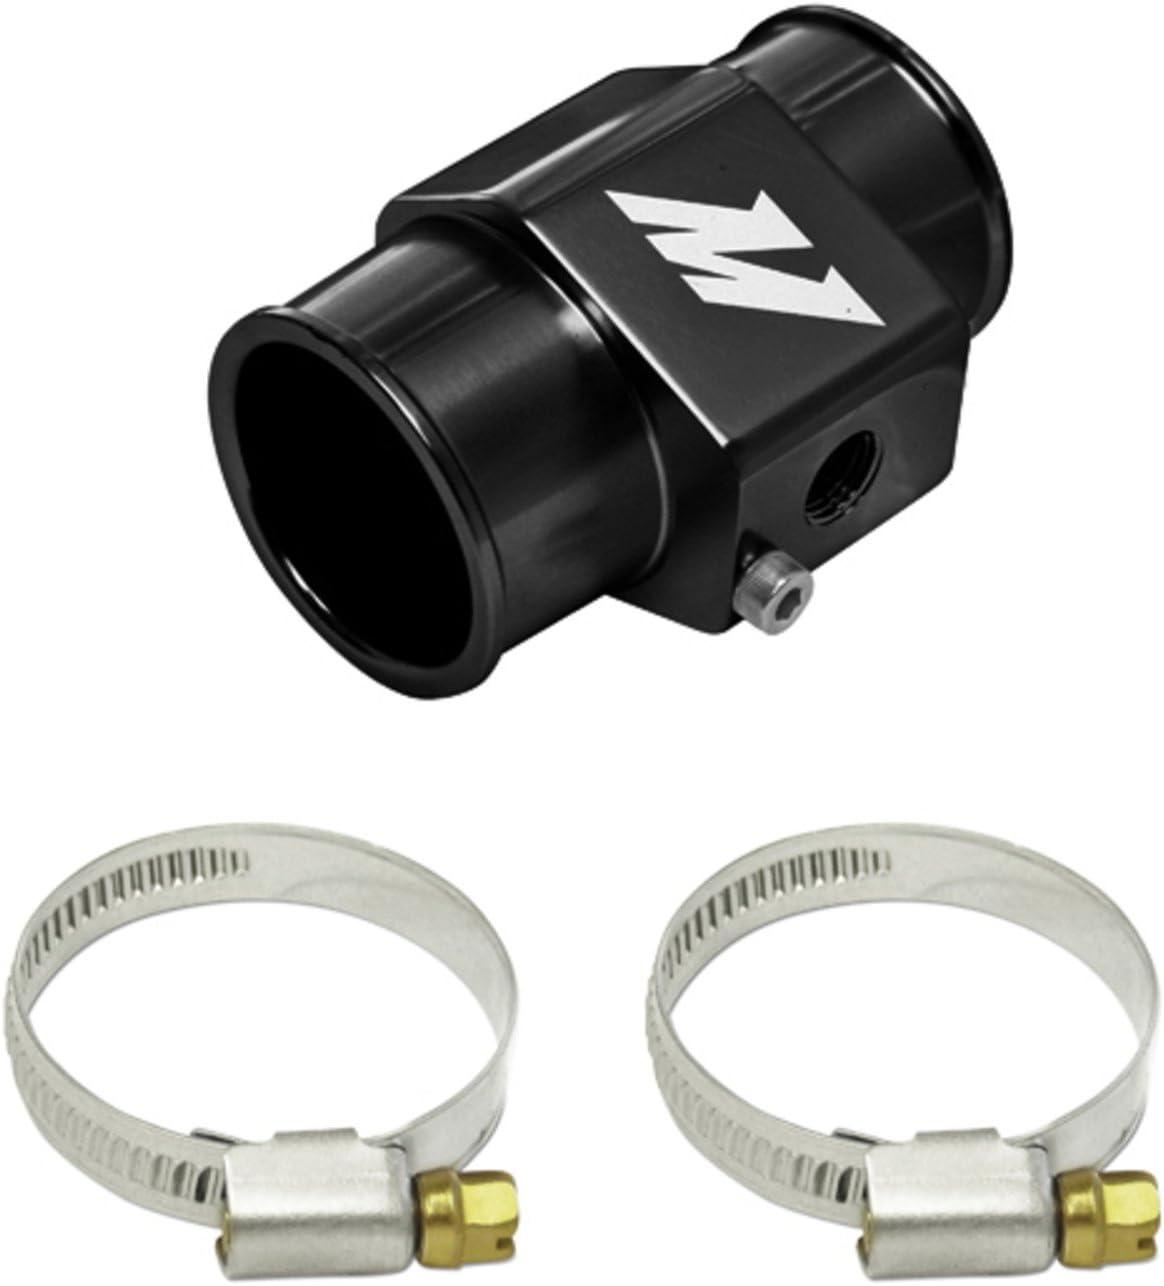 Water Temperature Sensor Adapter - 38mm - Black Mishimoto